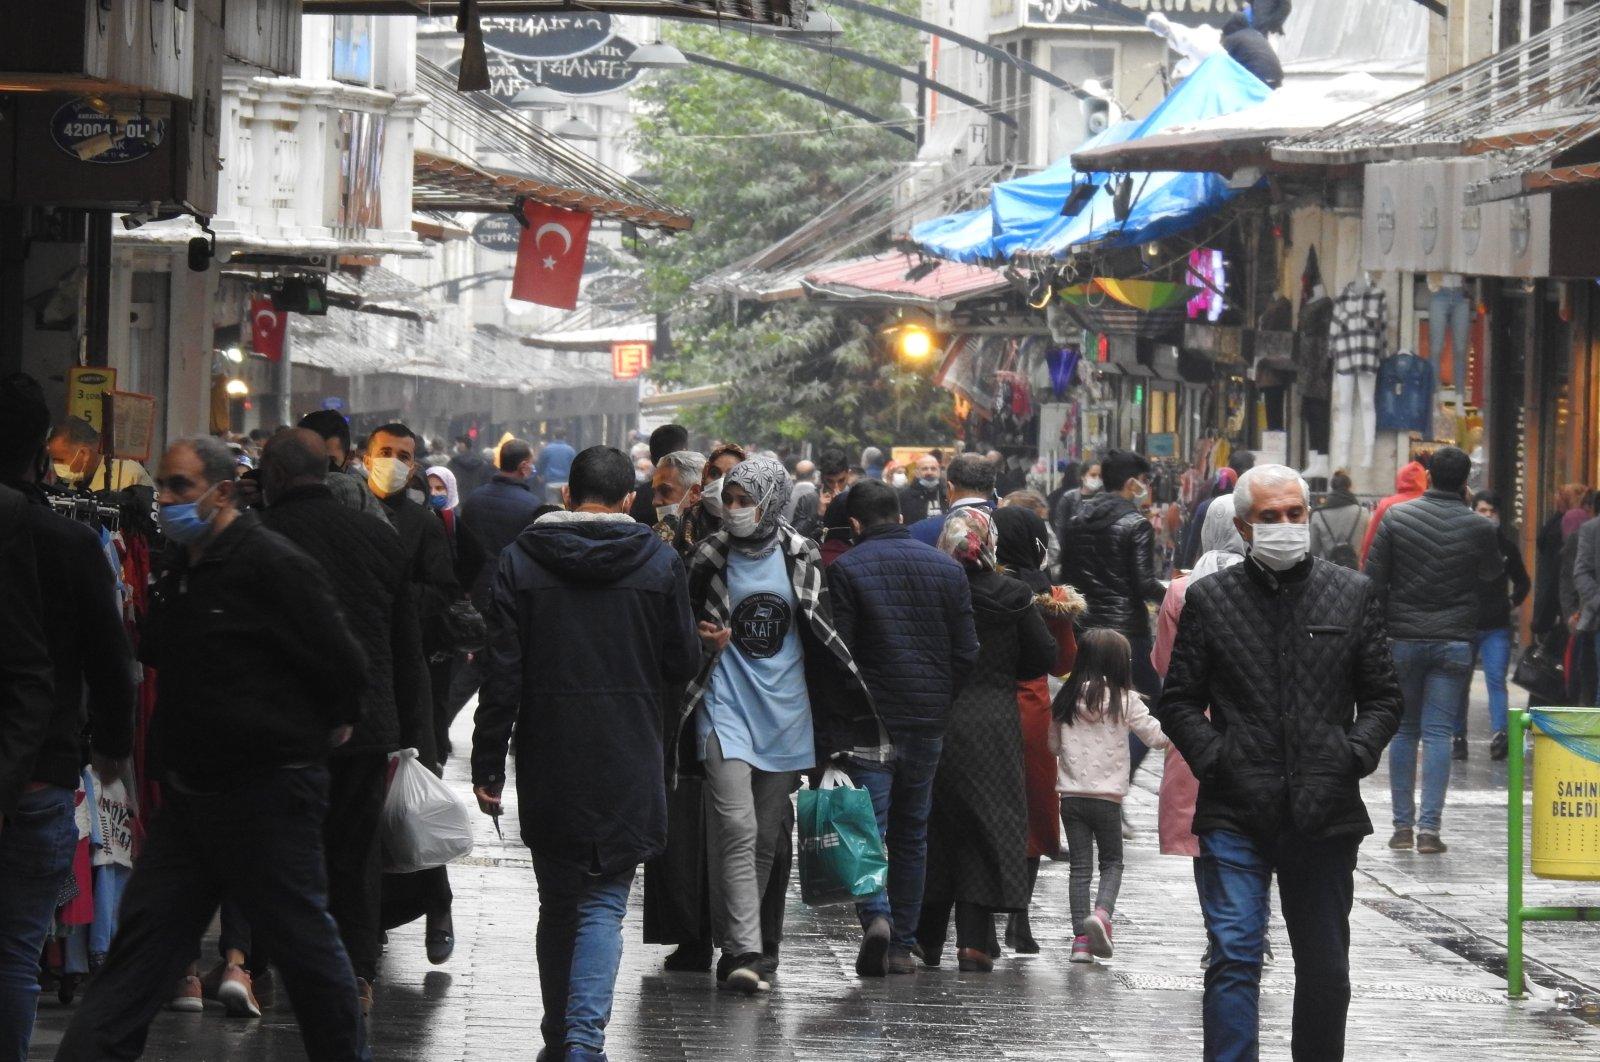 People wearing protective masks walk on a street in Gaziantep, southeastern Turkey, Nov. 5, 2020. (IHA Photo)